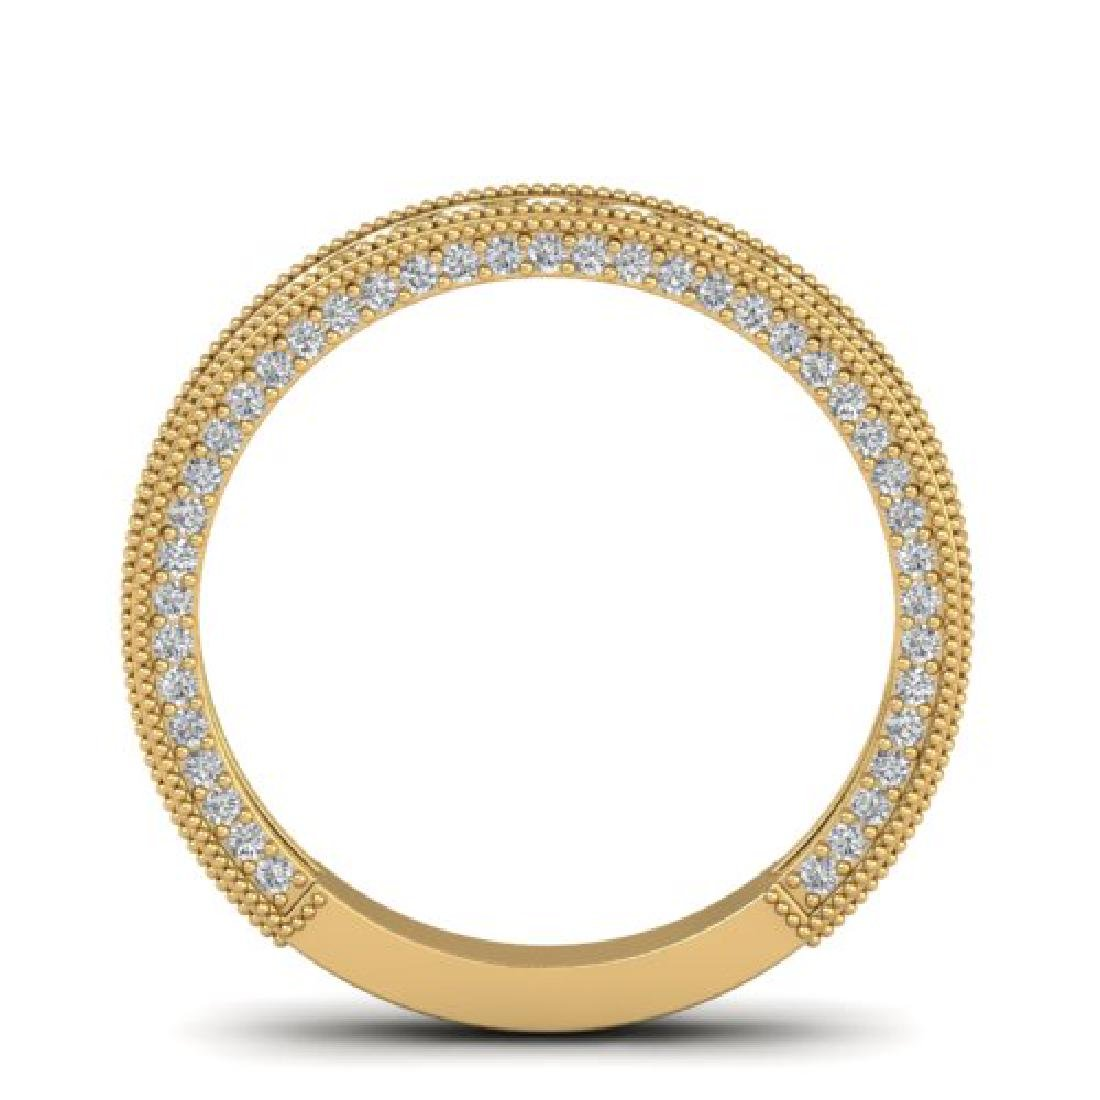 1.25 CTW VS/SI Diamond Art Deco Eternity Band Ring 18K - 3